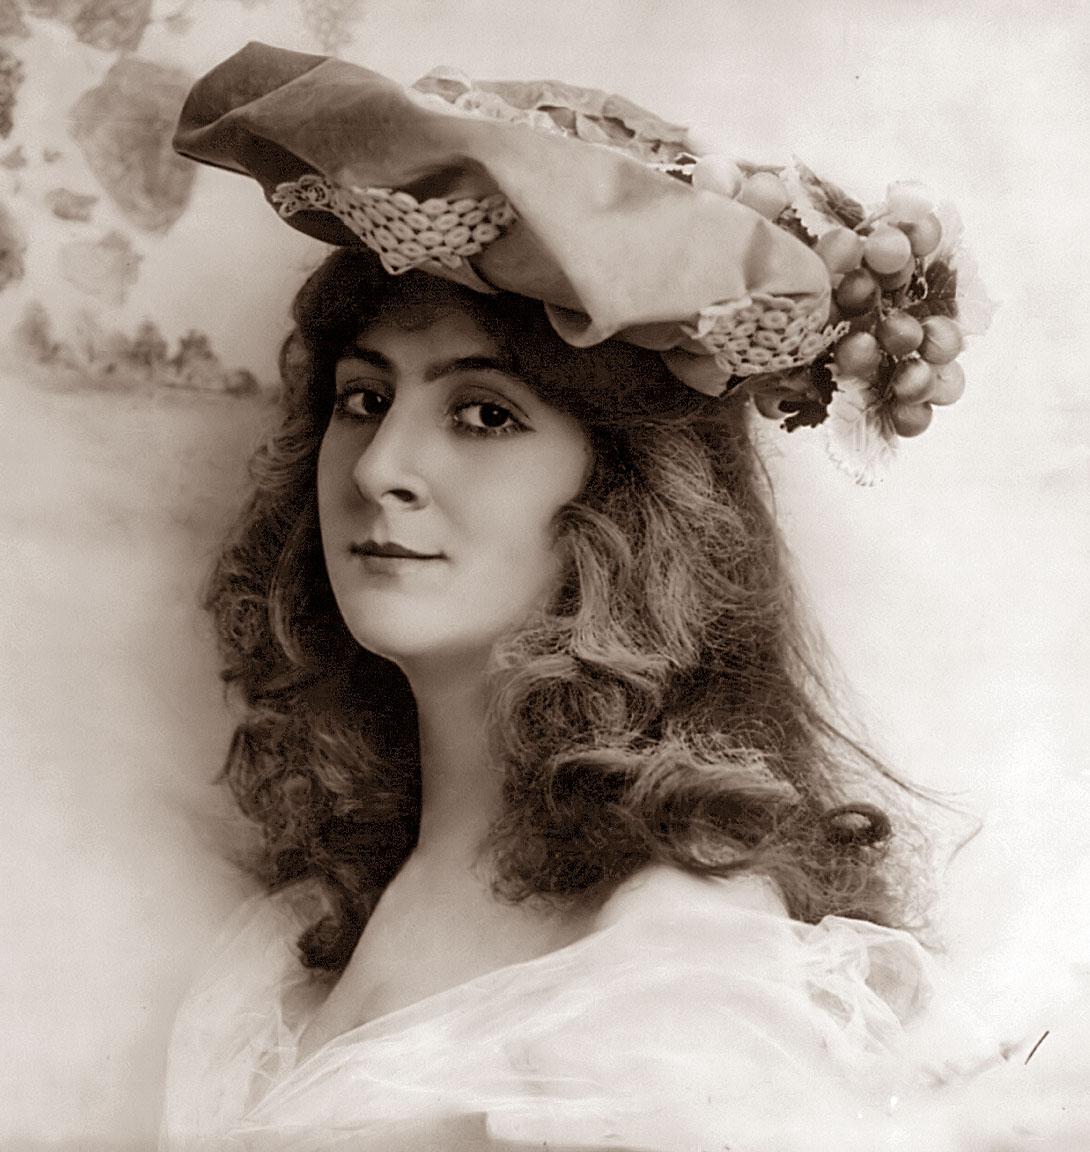 http://2.bp.blogspot.com/-fLi7tUbg67U/ULnkR7ubciI/AAAAAAACDd8/HKZBKH-Vlyk/s1600/lady-hat.jpg